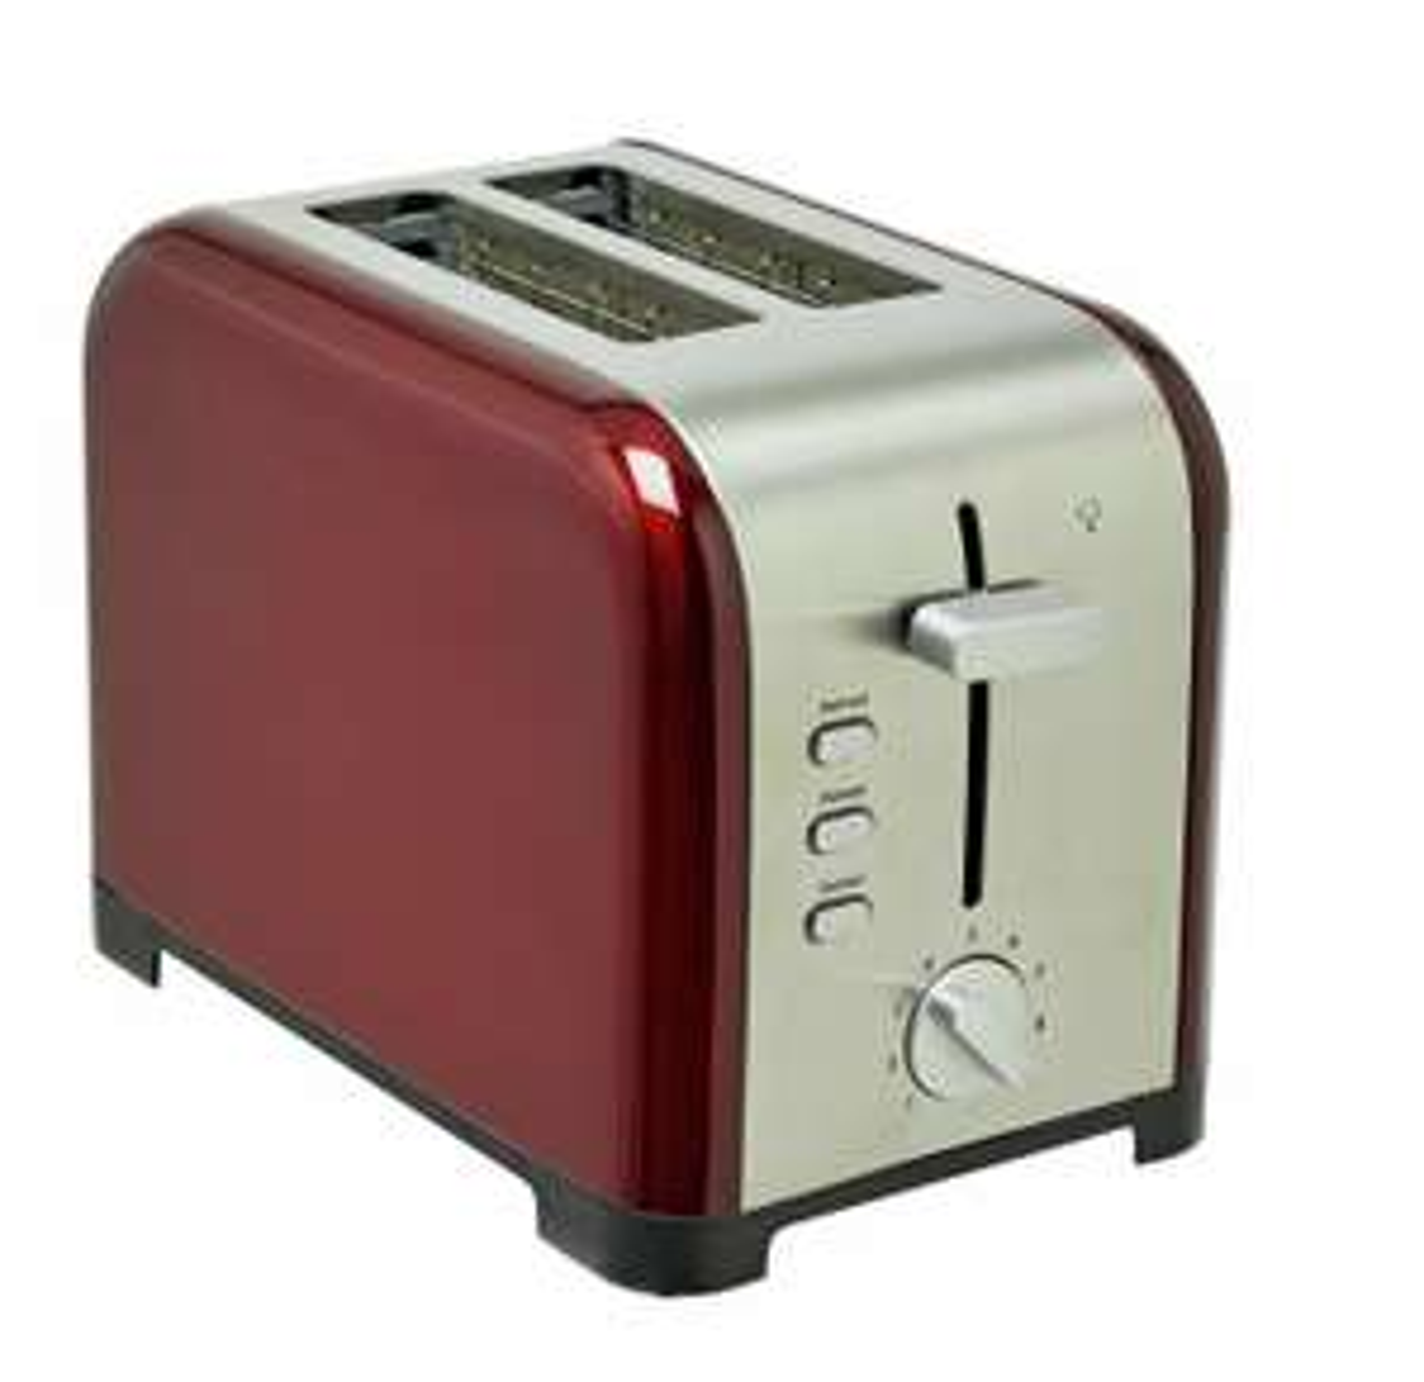 Cookworks 850W 2 Slice Wide Slot Toaster - £6.49 Delivered (More in OP from £5.49) - UK Mainland @ Argos/eBay